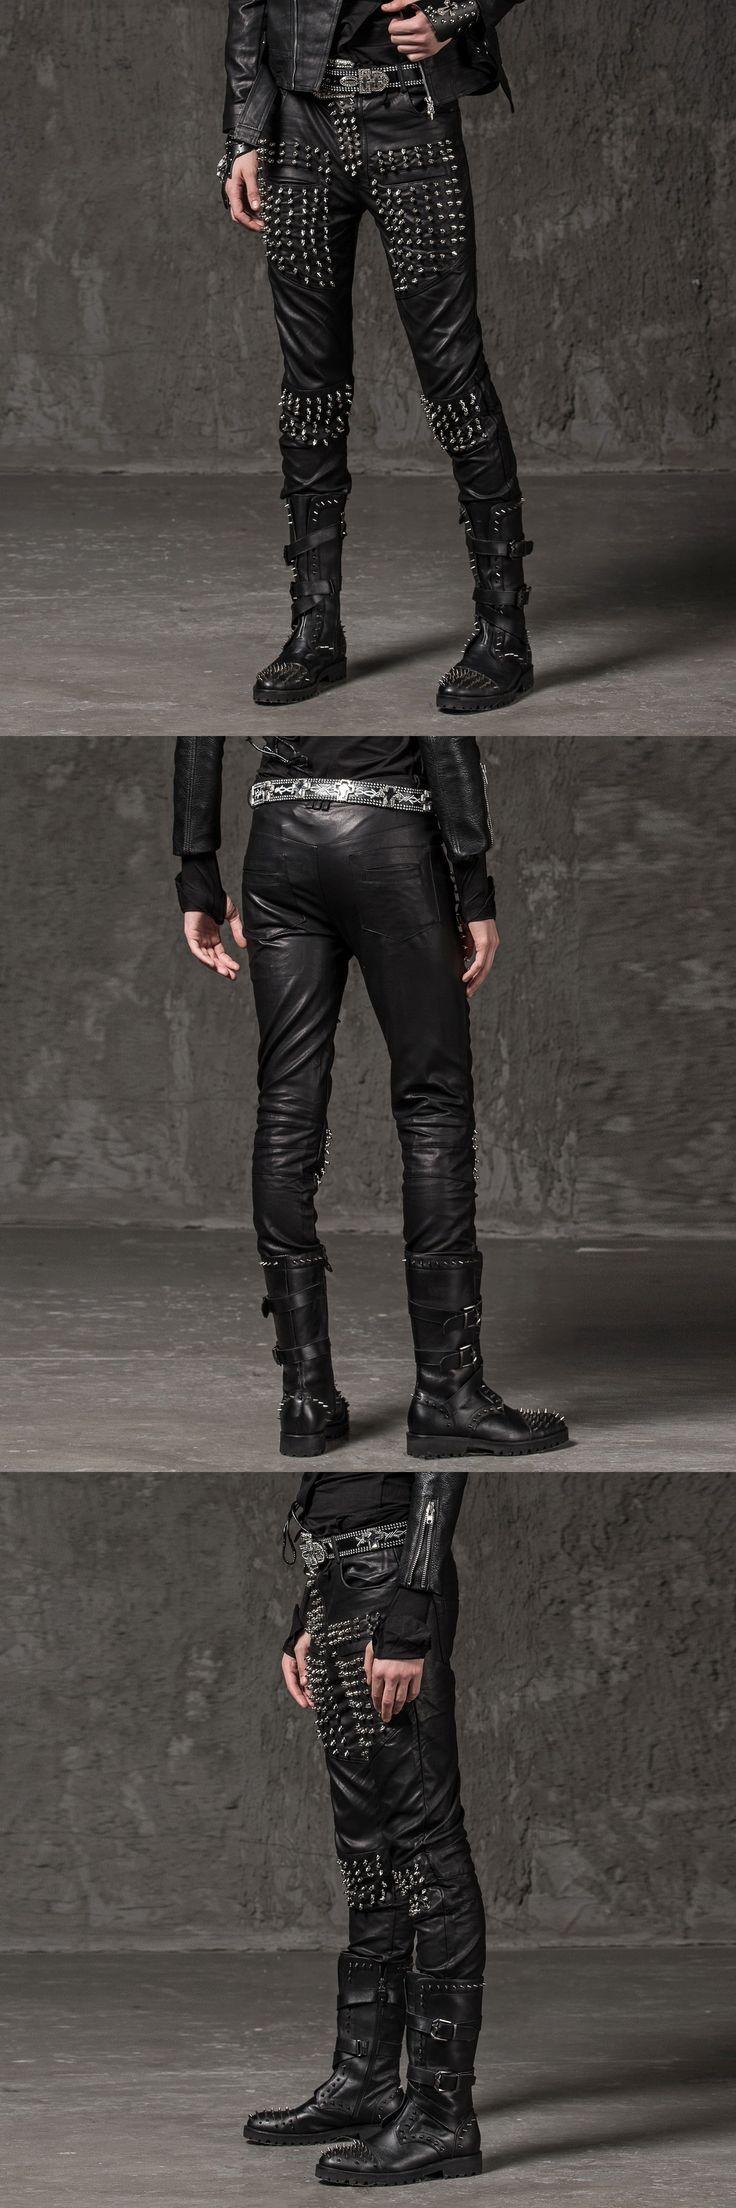 Men's Rivet Leather Pants 2017 New Fashion Brand Club Costumes Stage Wear For Singer Leather Trousers Men Black Locomotive Pants